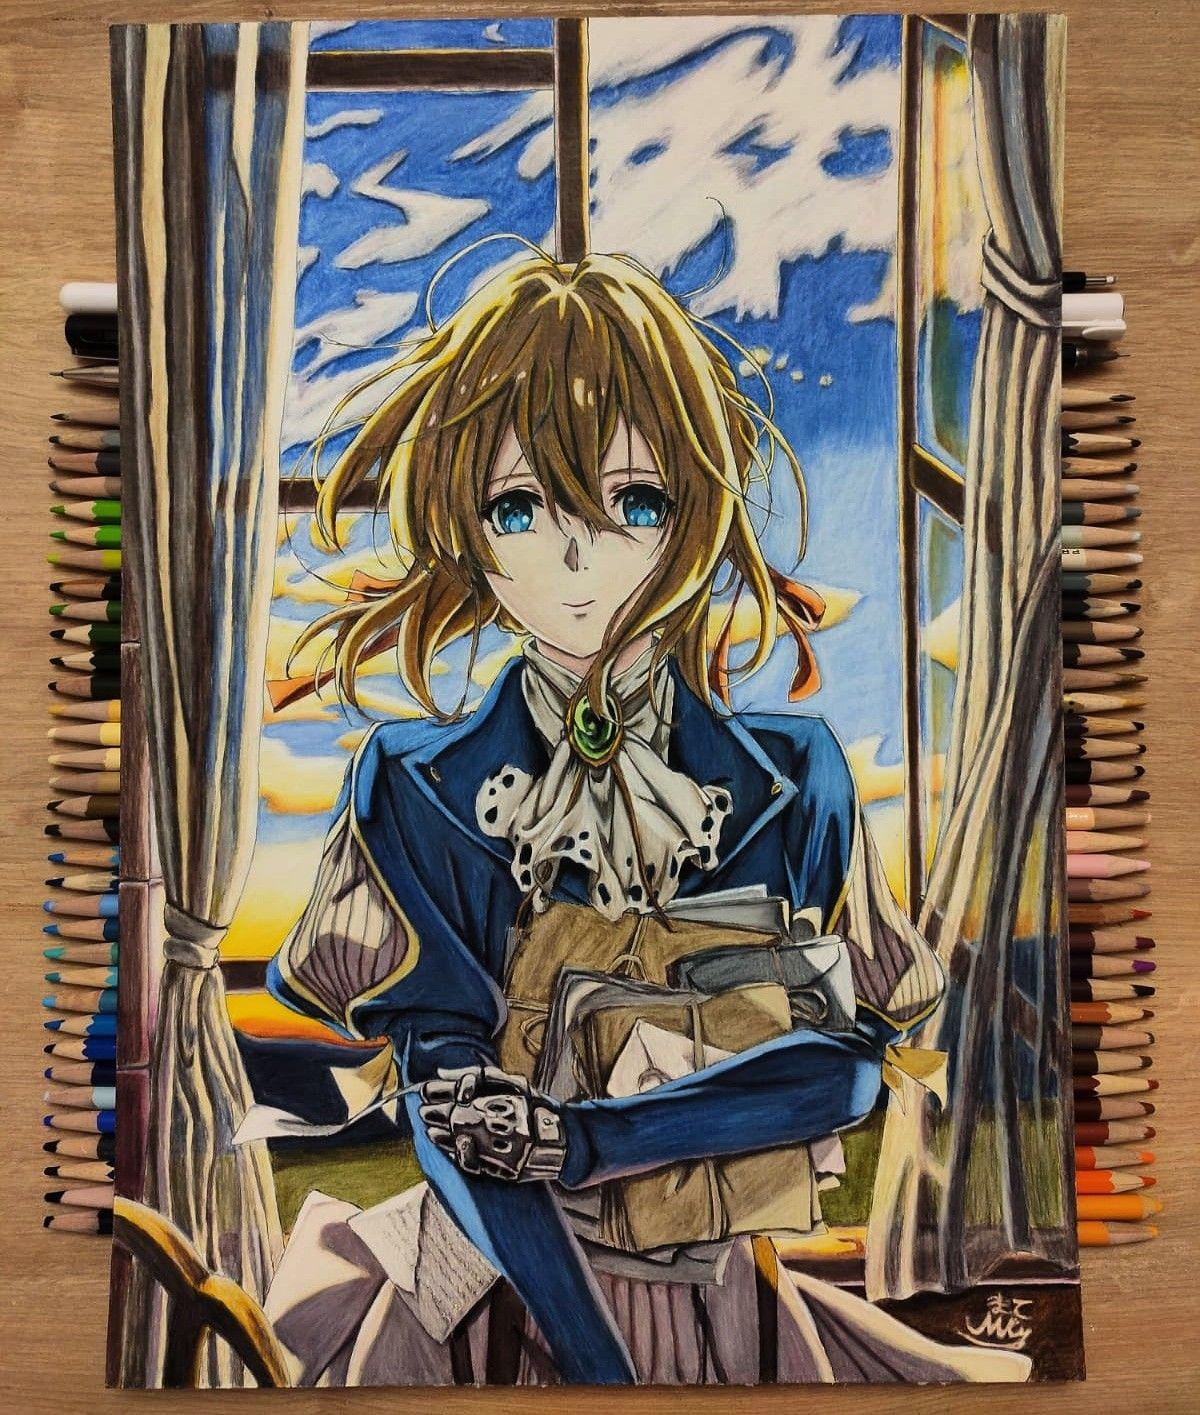 Violet Evergarden Anime Drawings Anime Sketch Art Drawings